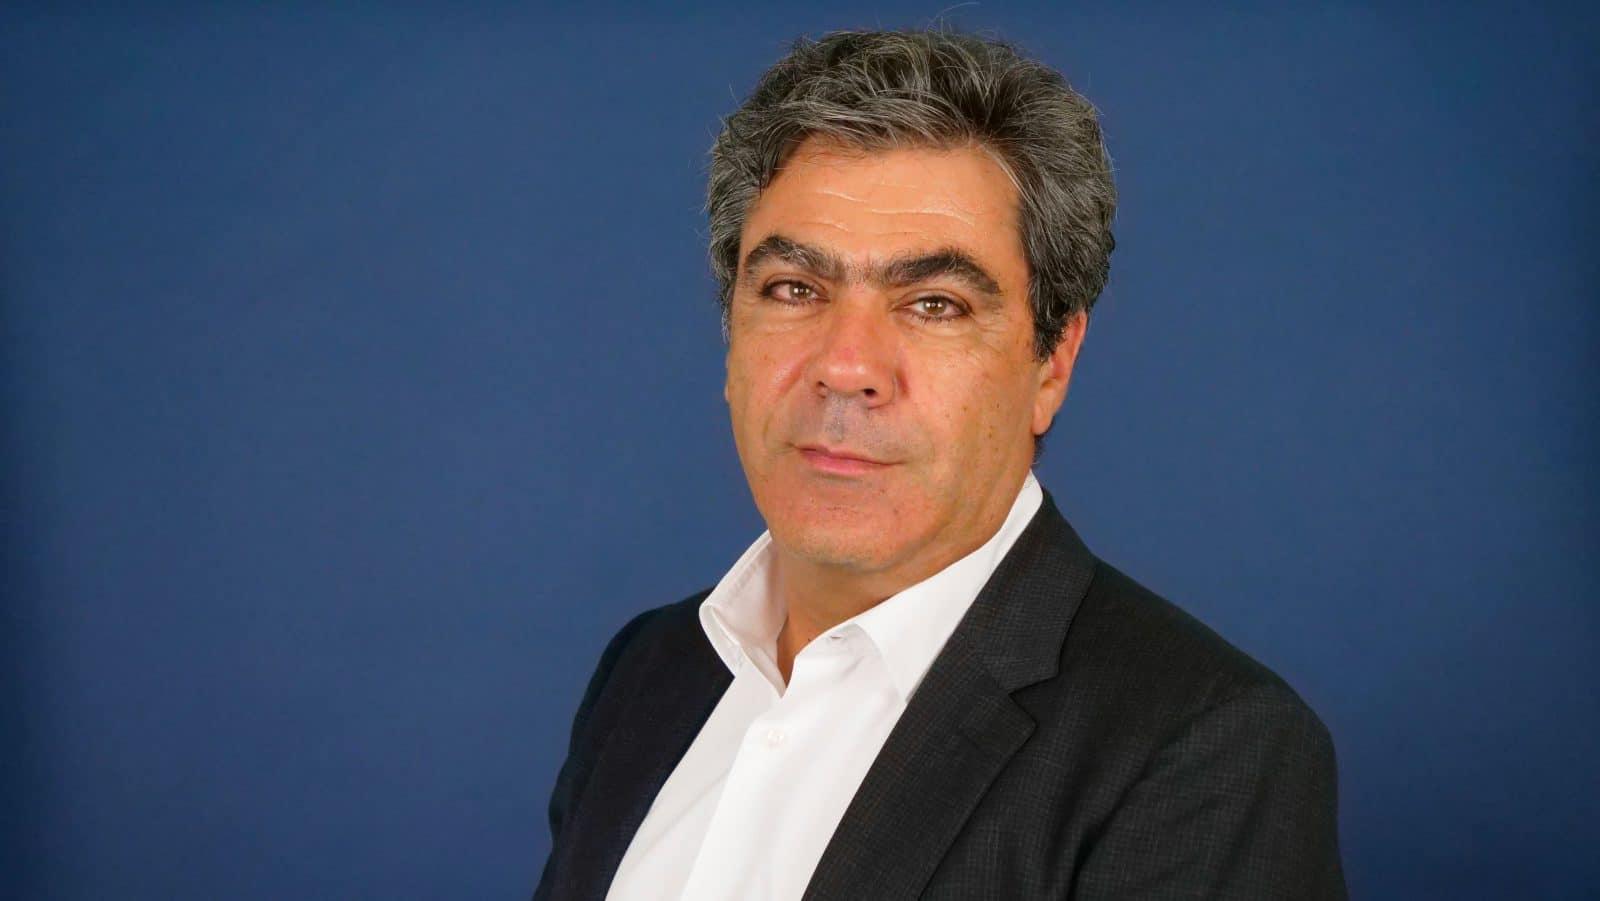 Jean-Marc Sabet